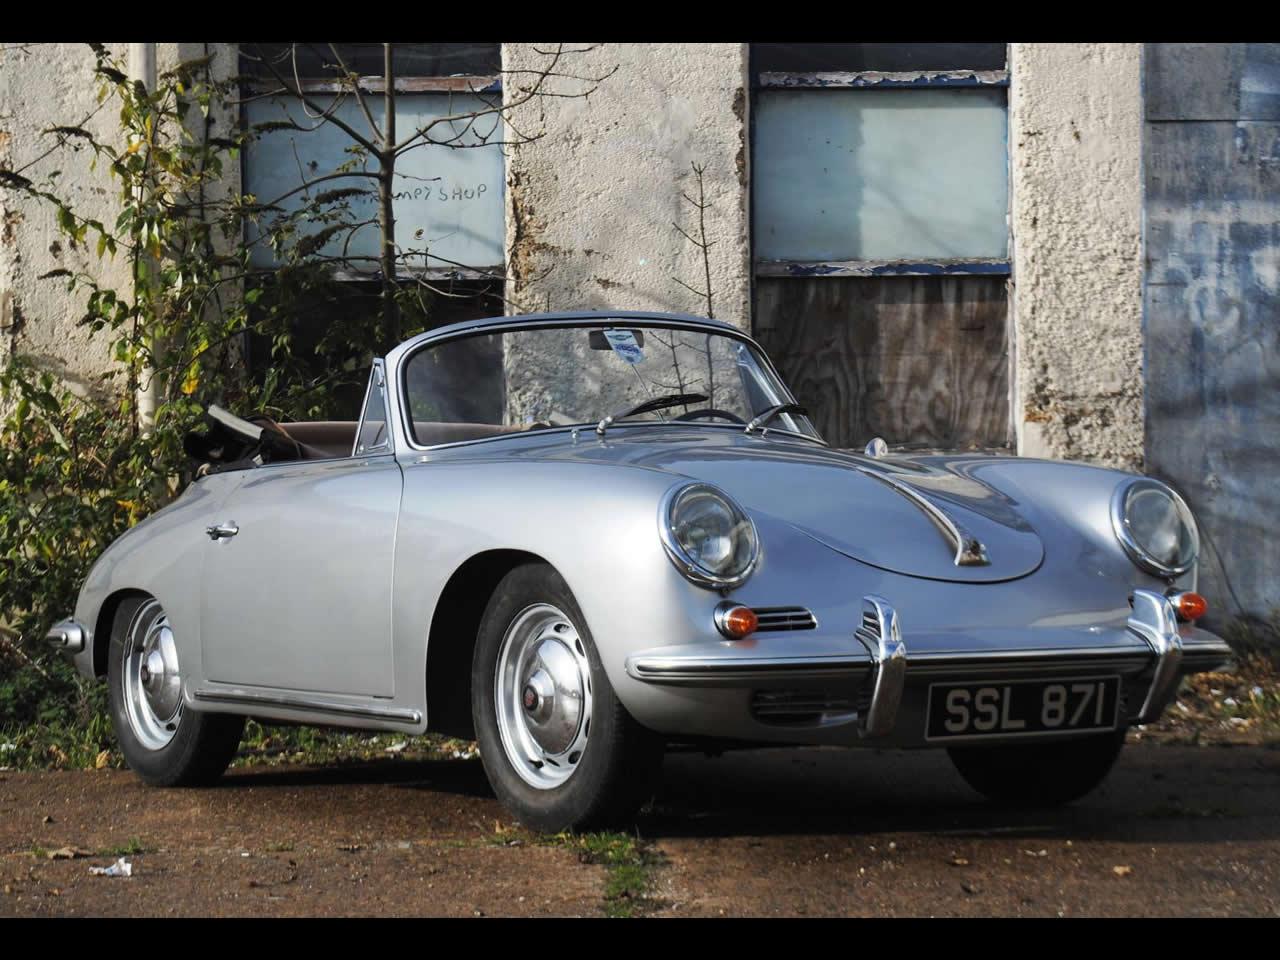 Classic Porsche 356 Convertible Buying Guide